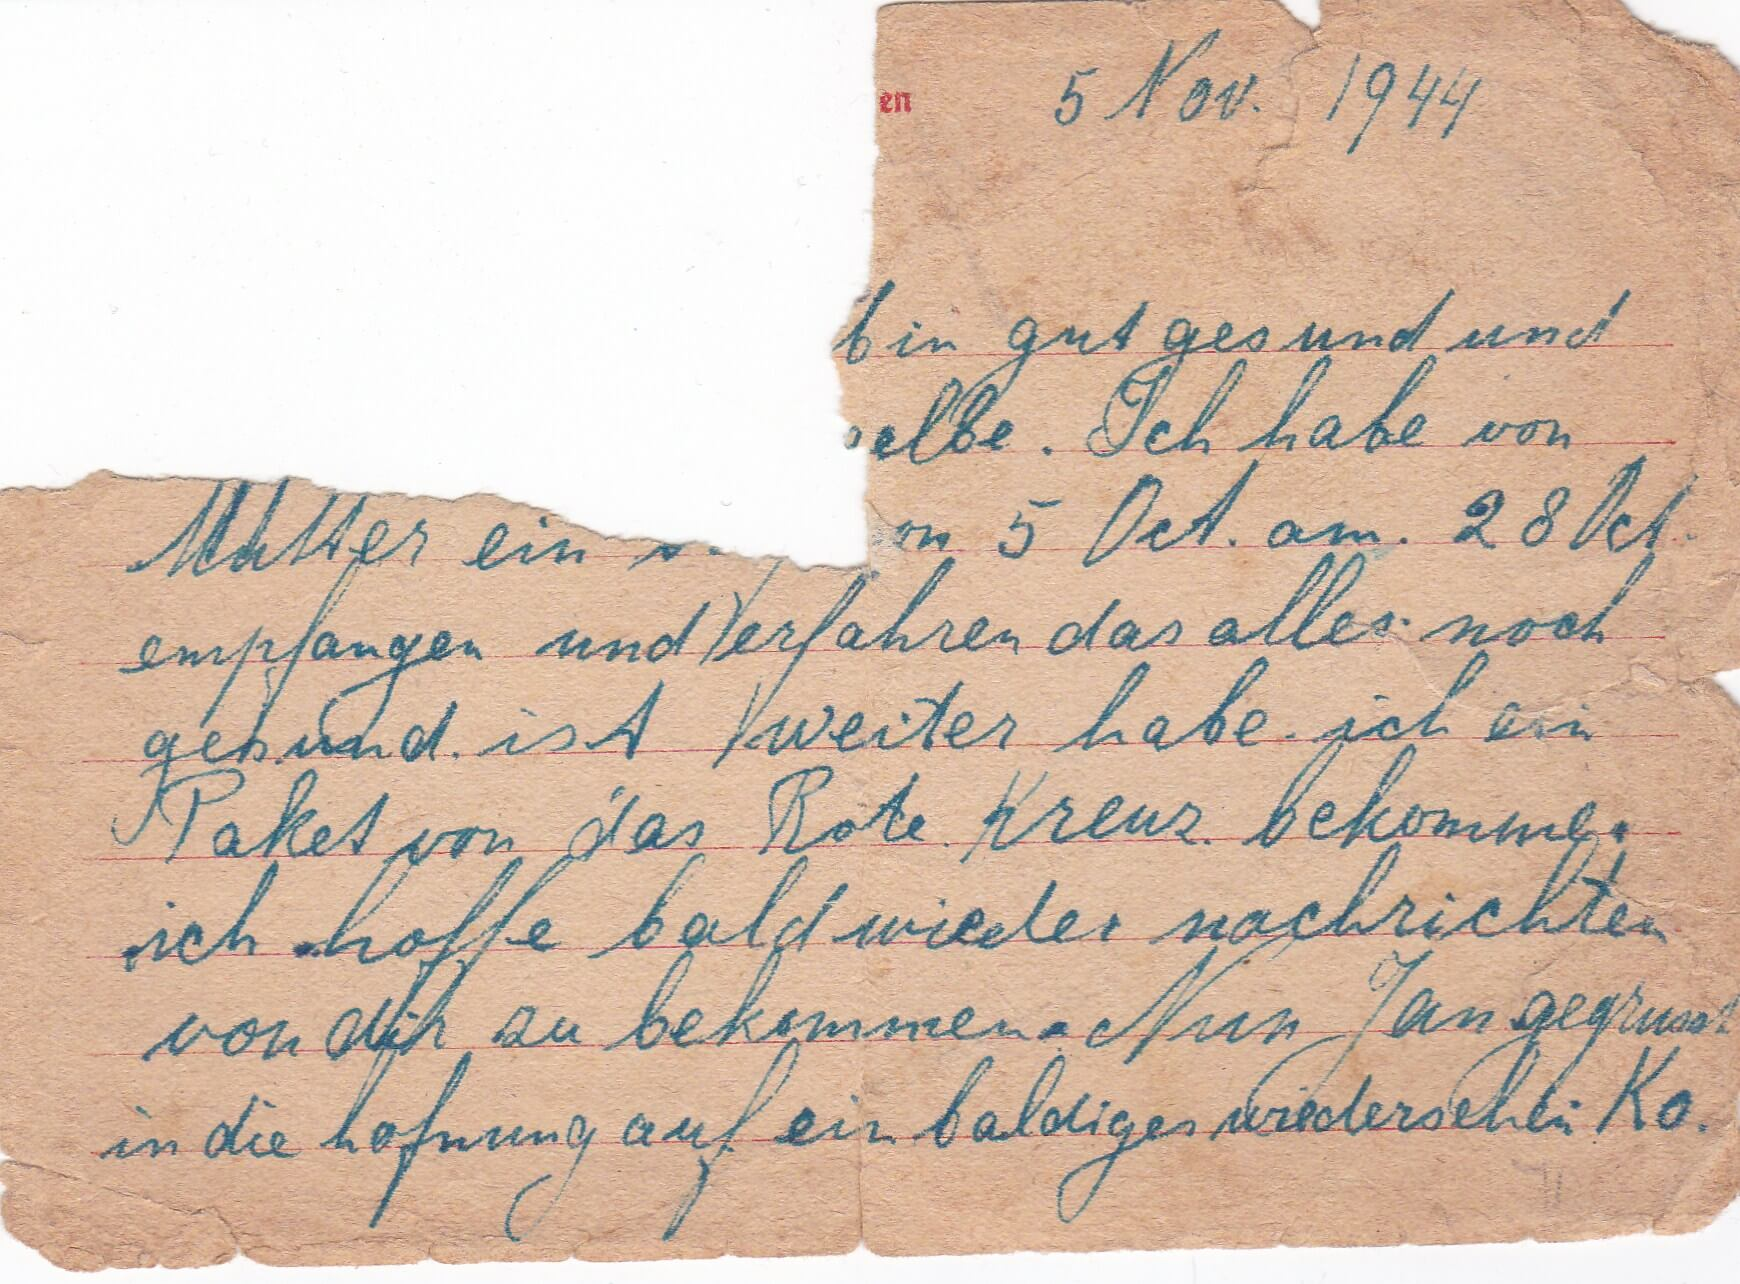 Concentratiekamp brieven Neuengamme 05-11-1944